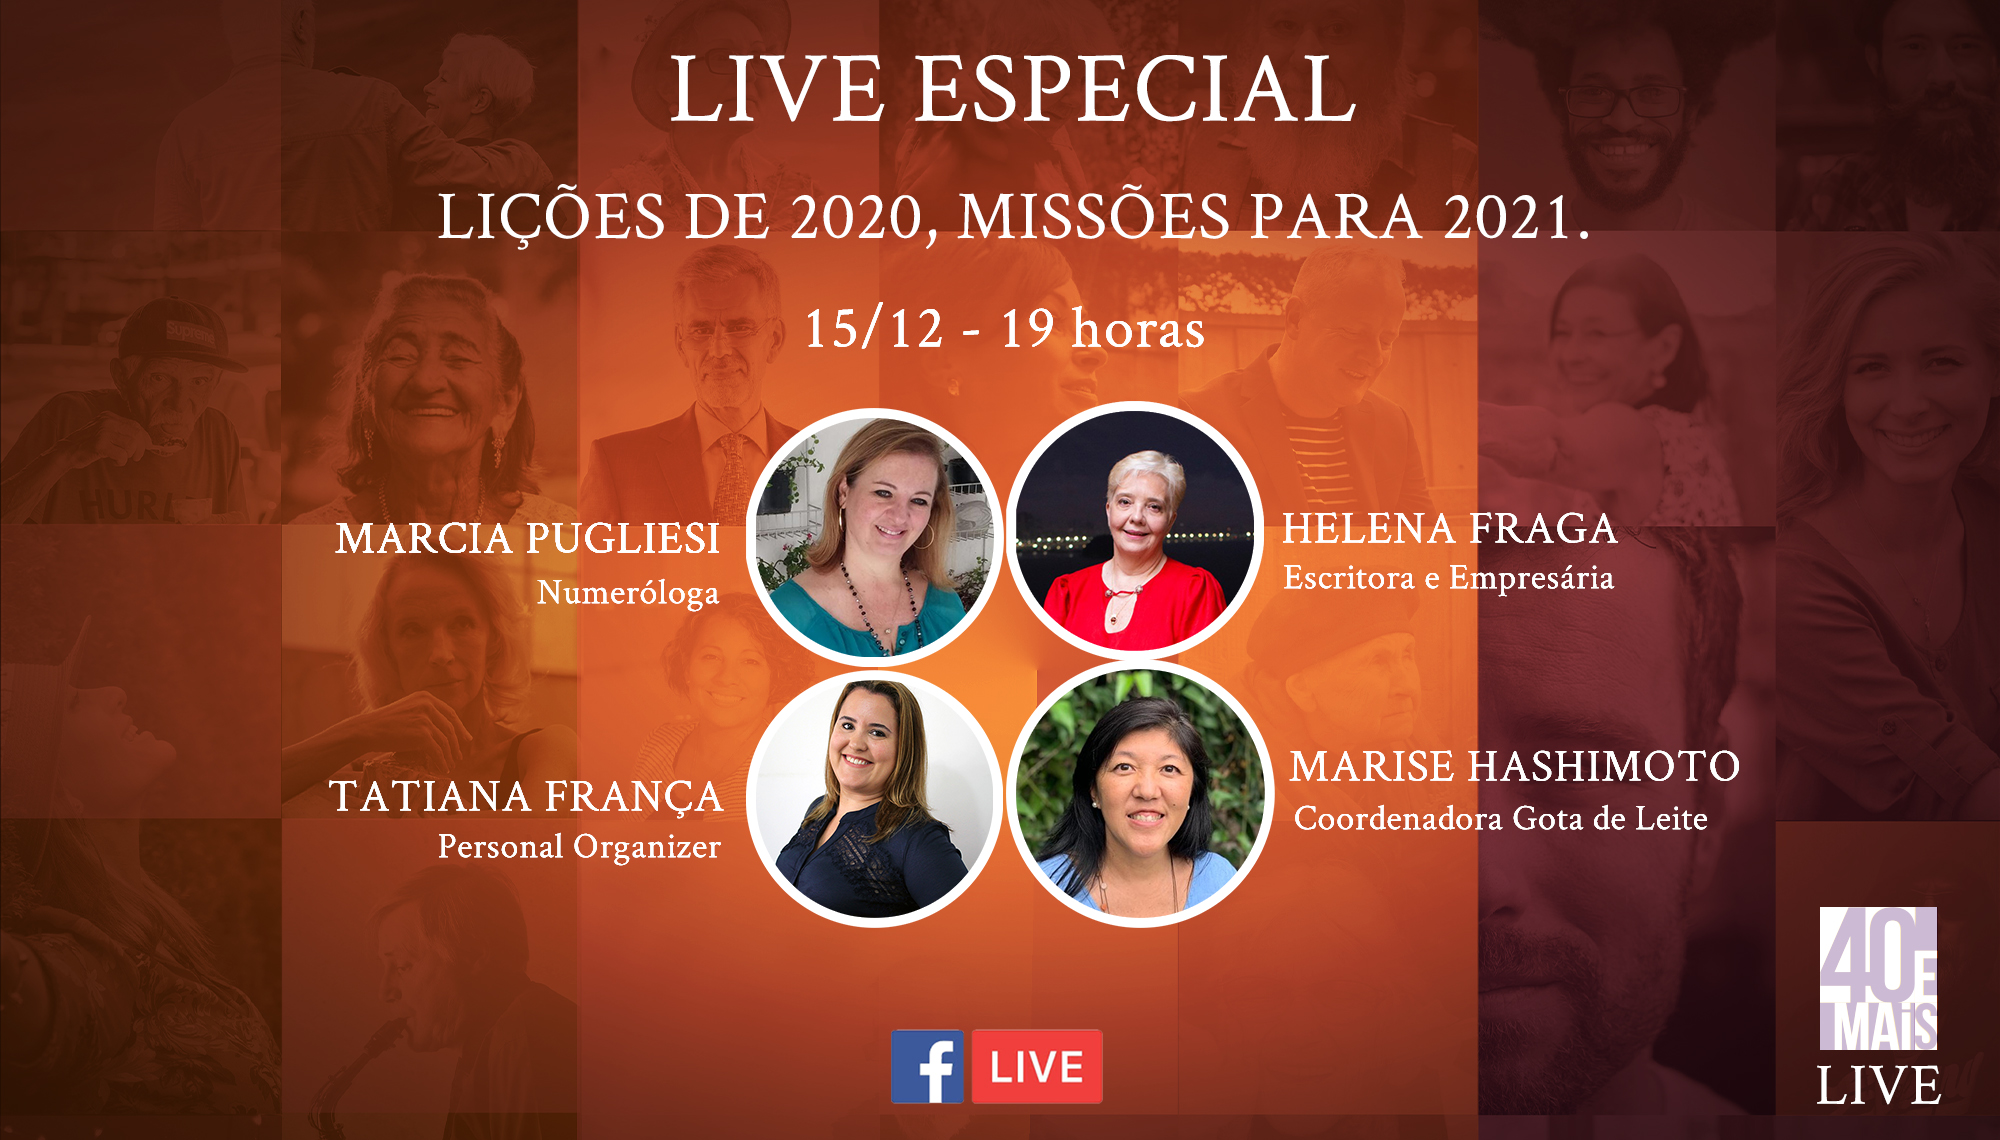 Live especial